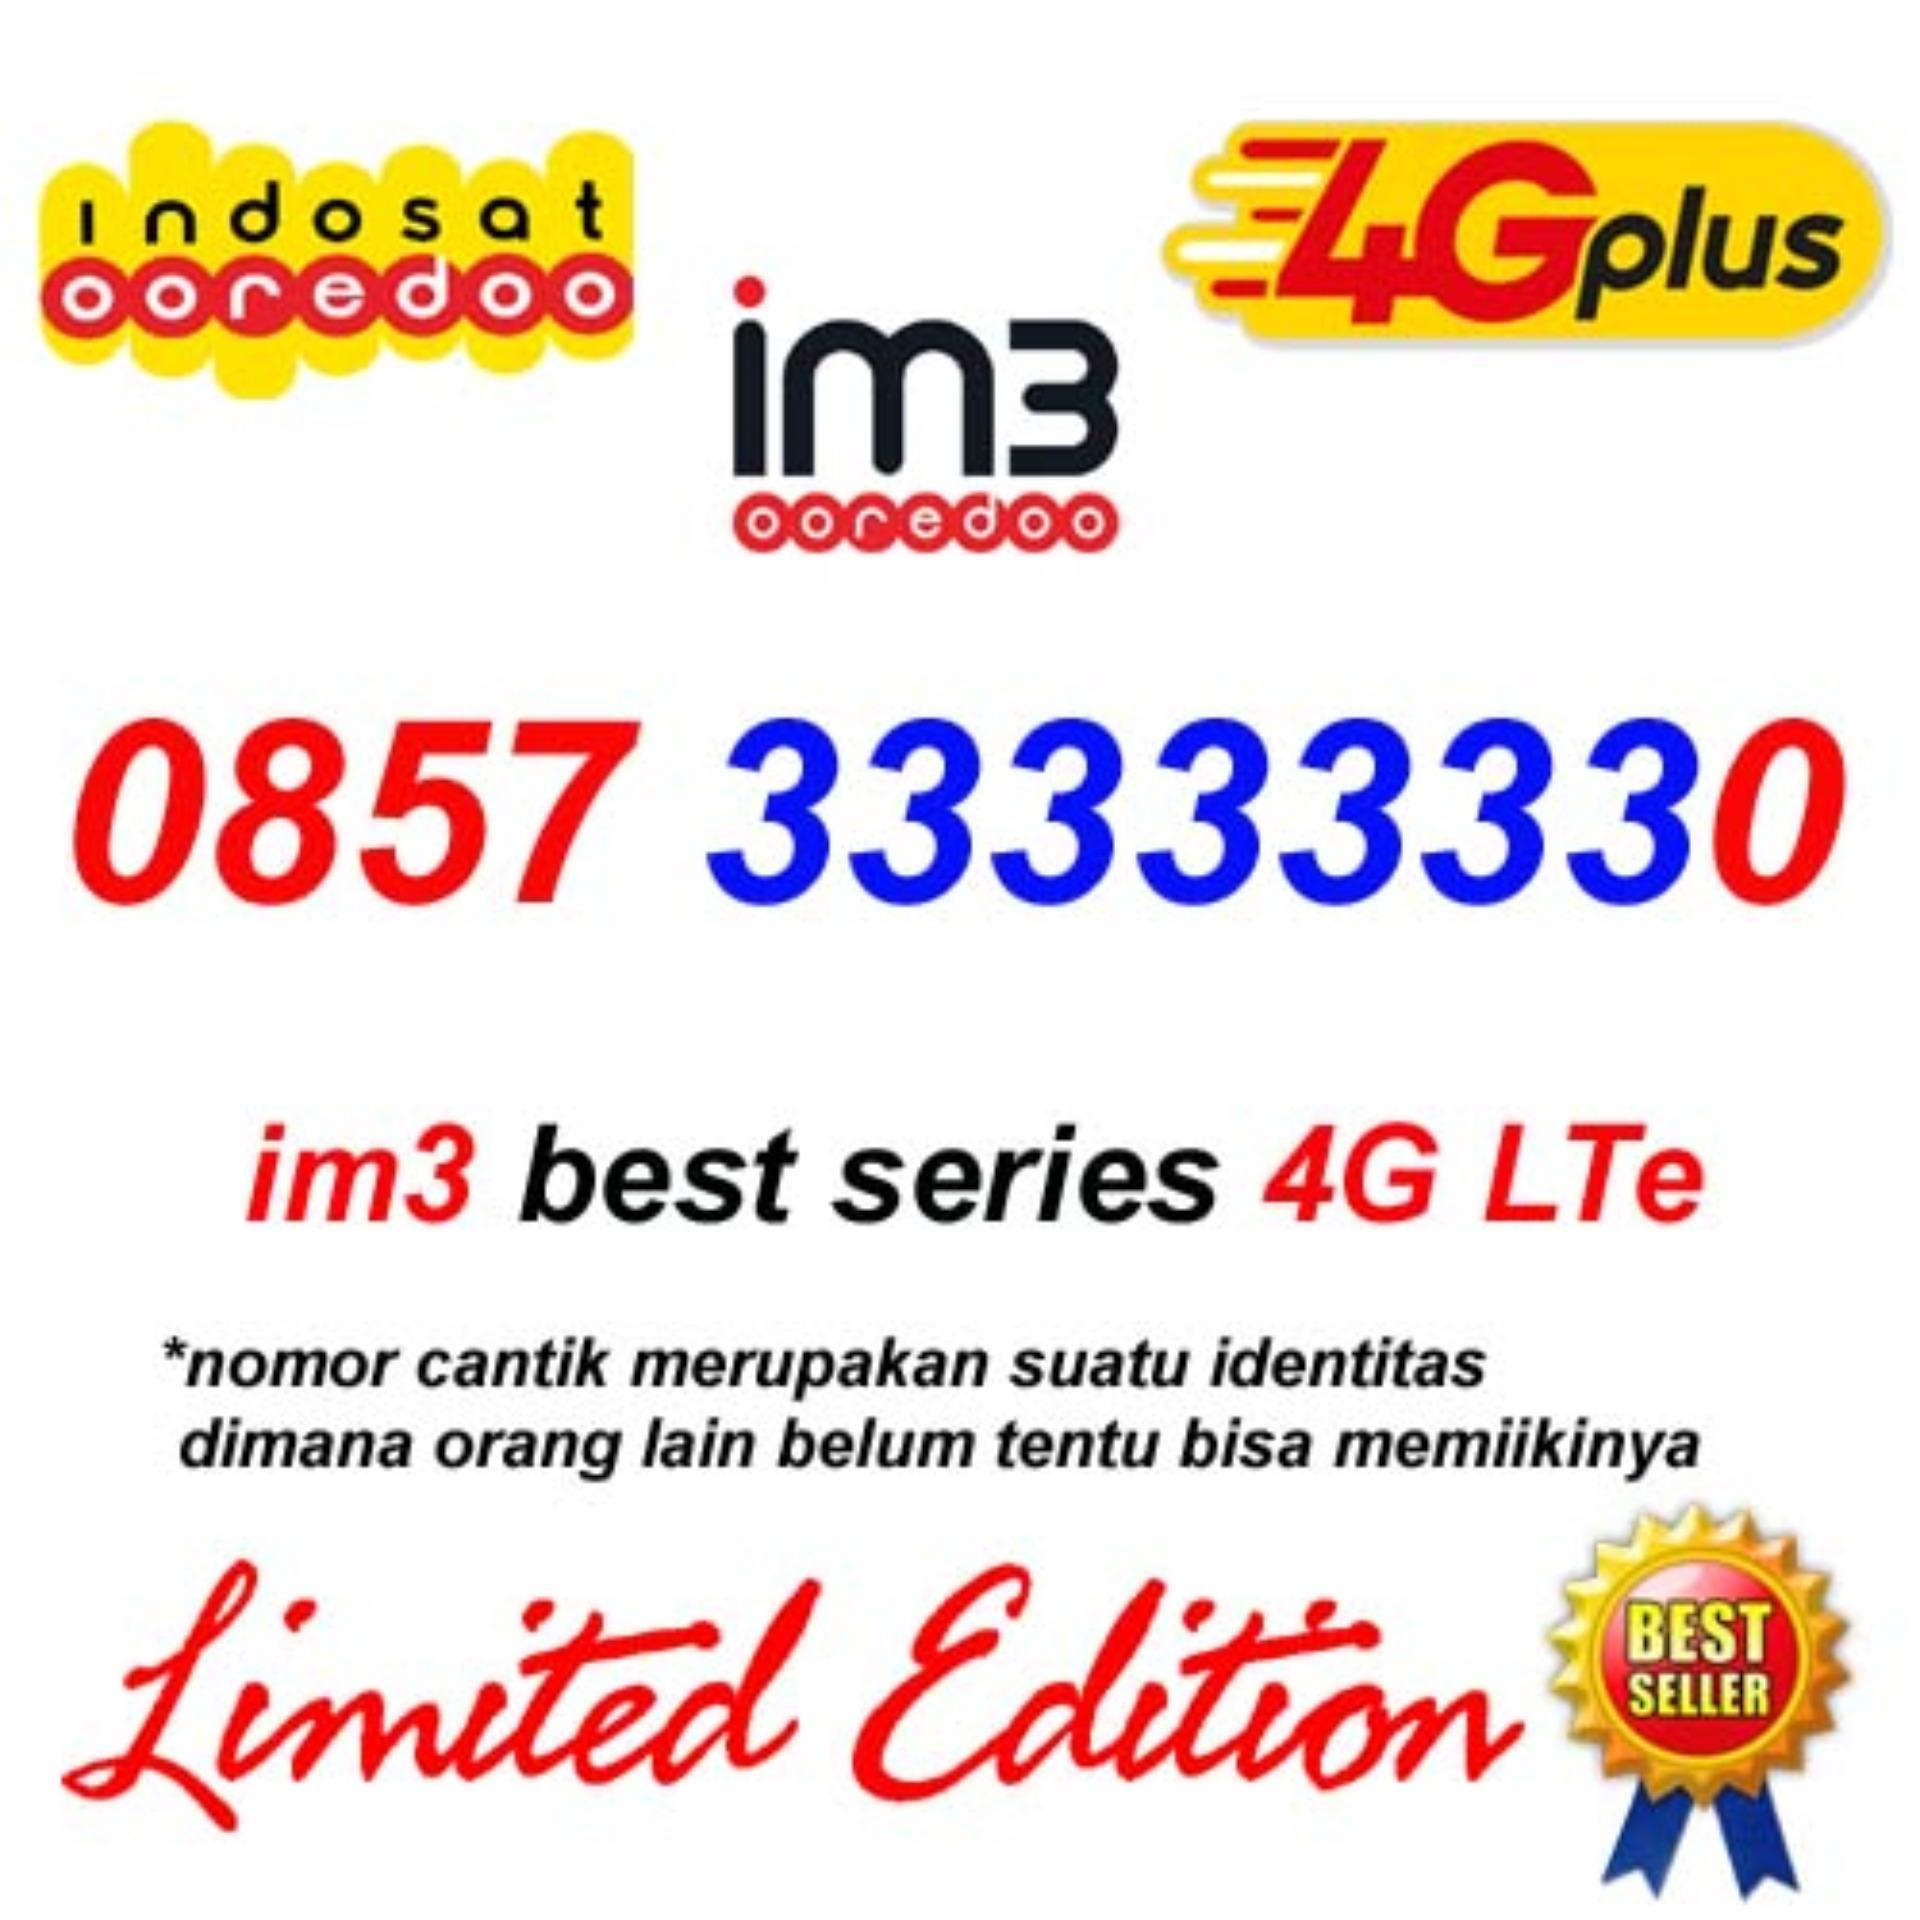 Indosat Im3 0857 33333330 Kartu Perdana Nomor Cantik Super